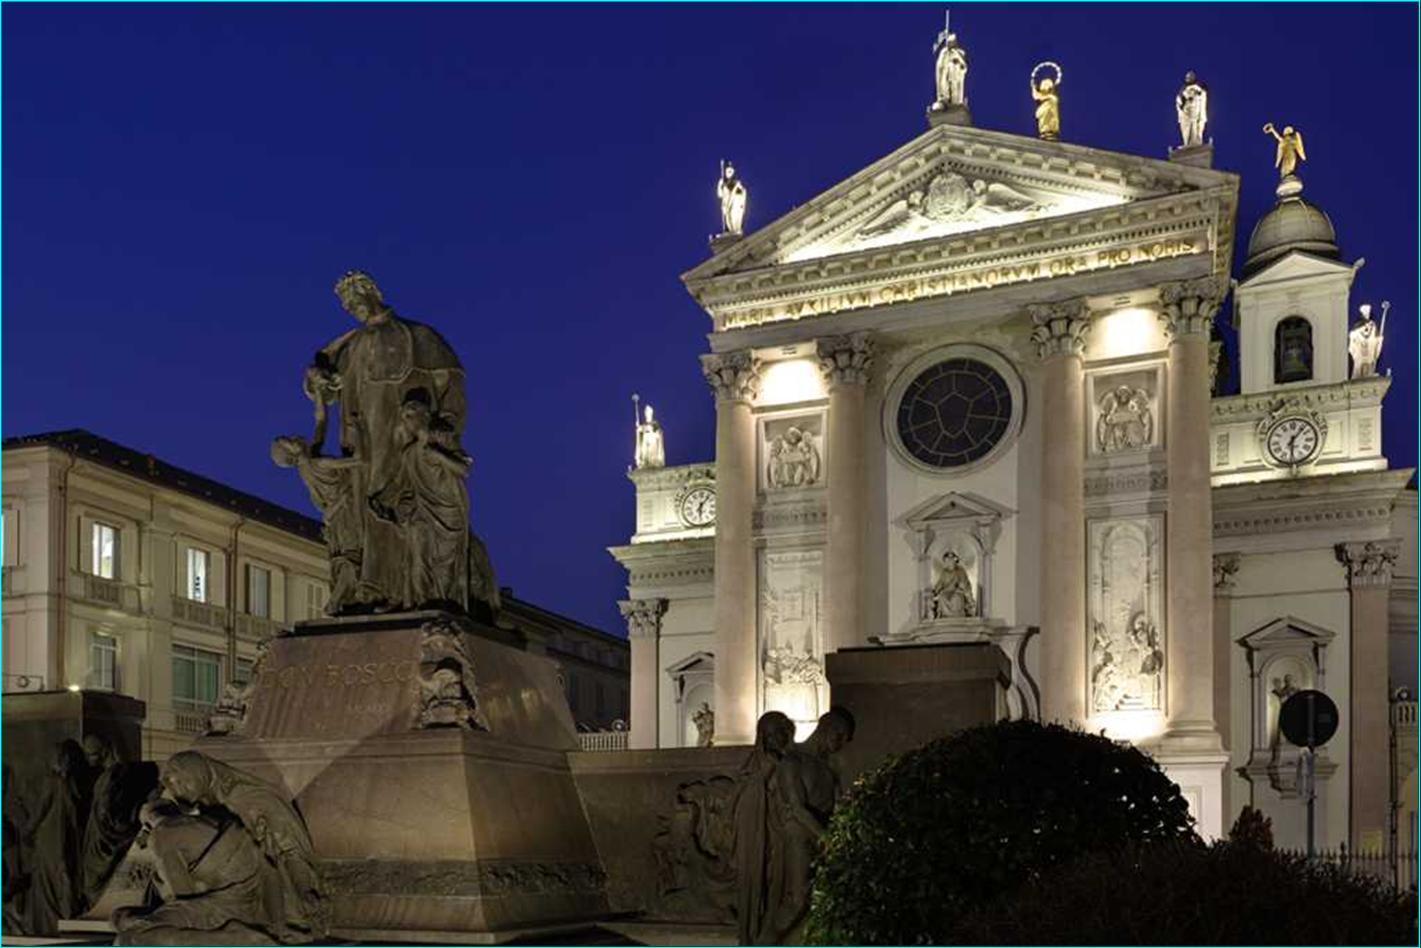 SAN JUAN BOSCO - Web católico de Javier - HD Wallpapers